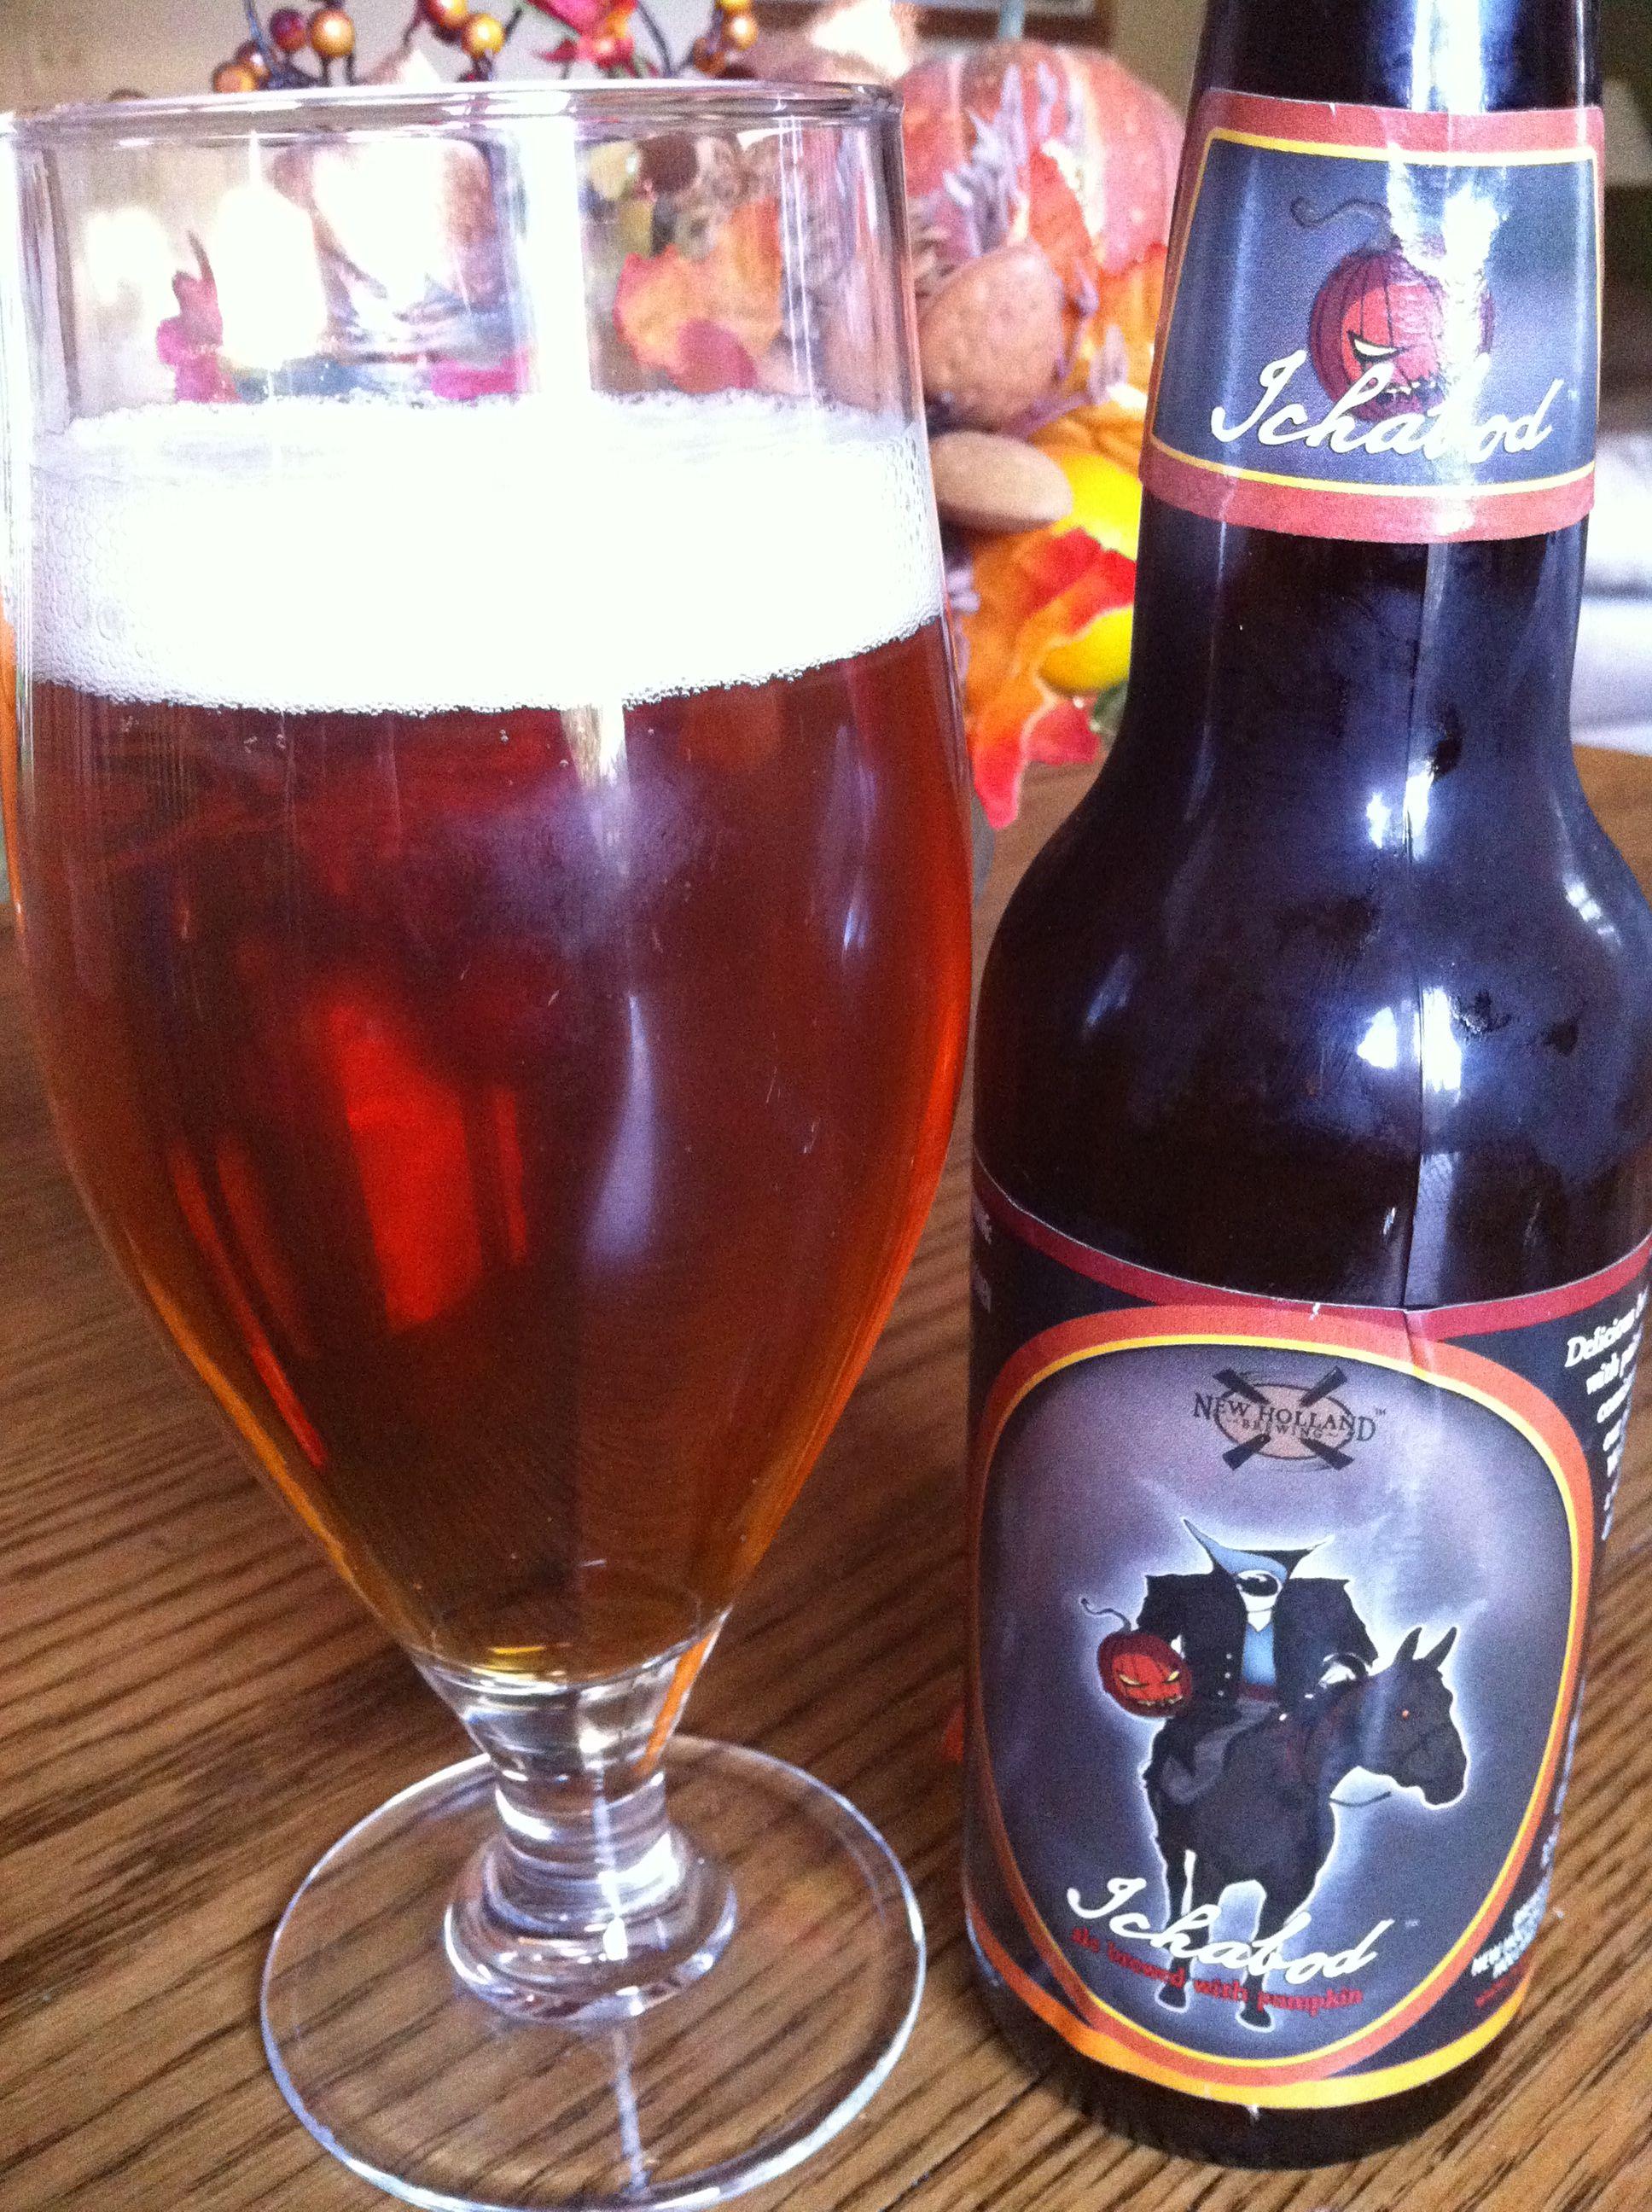 185 New Holland Brewing Ichabod 1000 Beers Craft Beer Beer Brewing